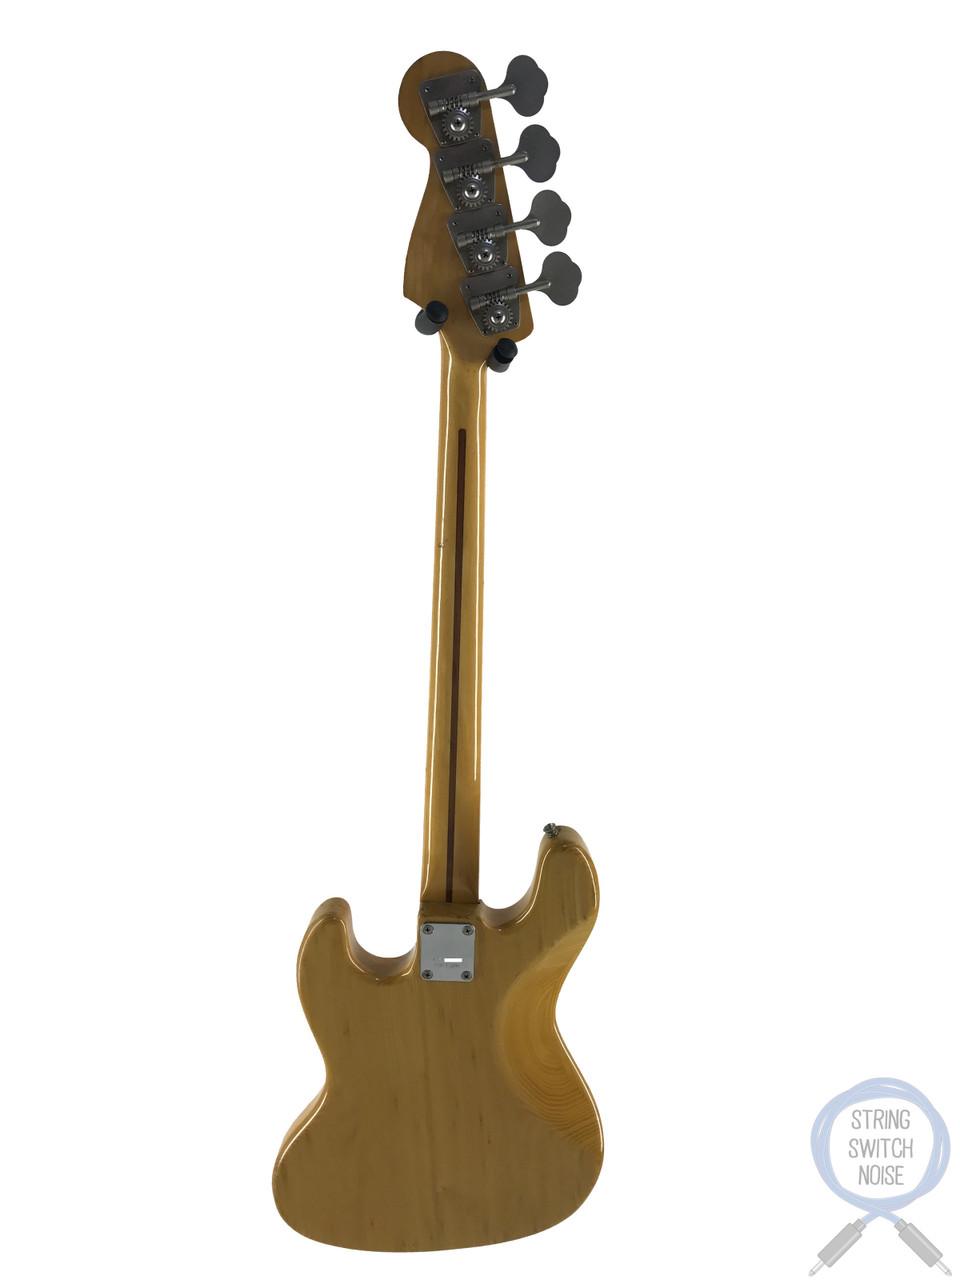 Greco Jazz Bass, JB600, Natural Ash, 1976 vintage, MIJ